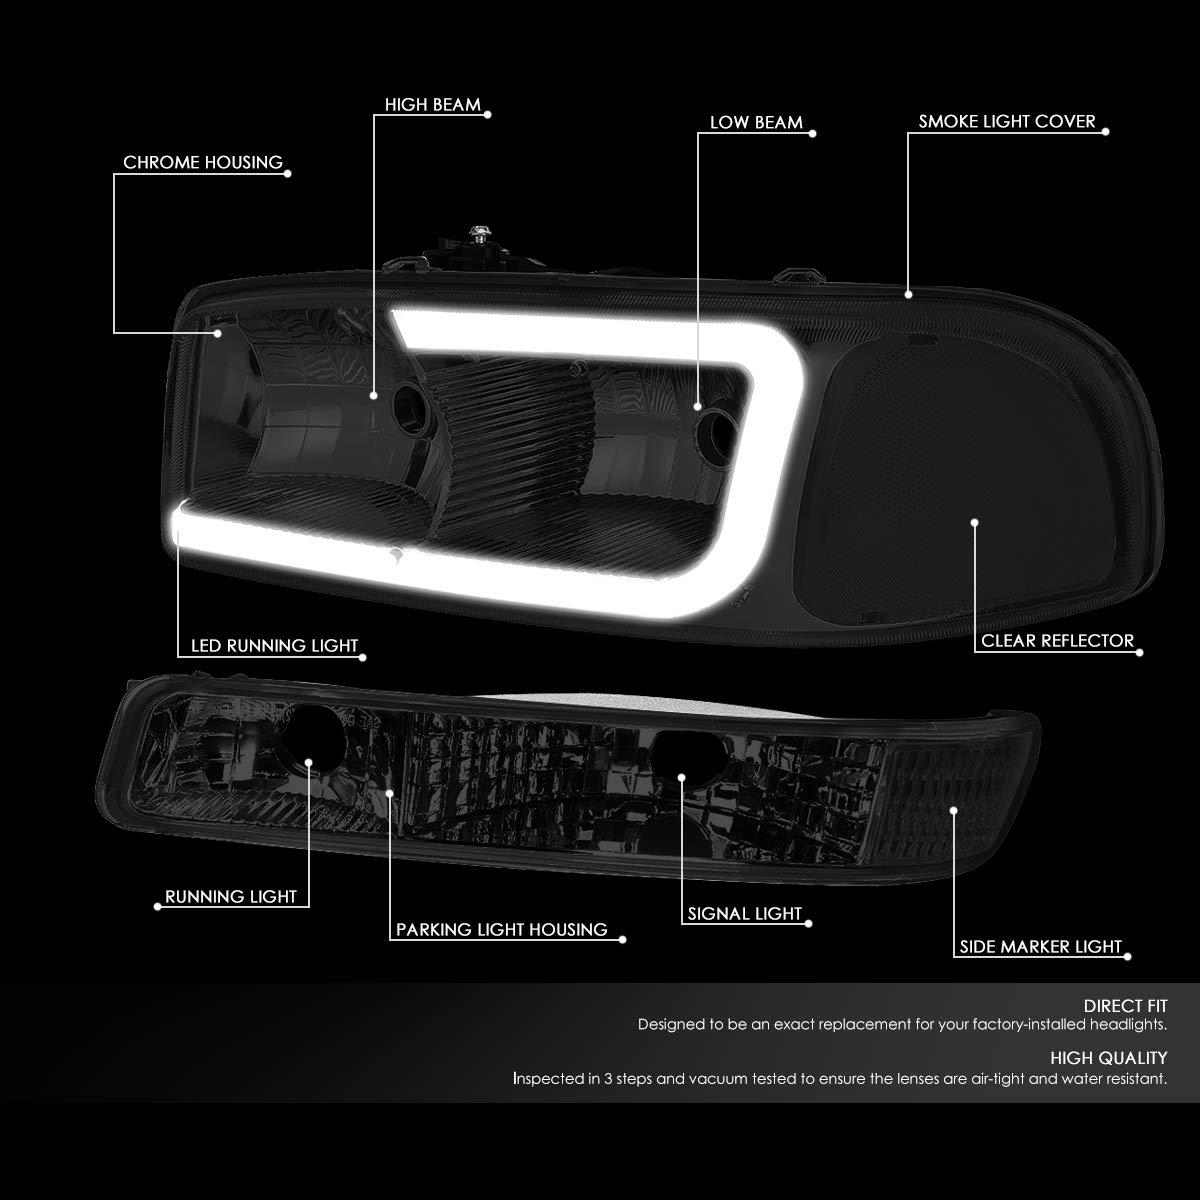 Genuine Hyundai 84695-3N200-RY Console Storage Box Cover